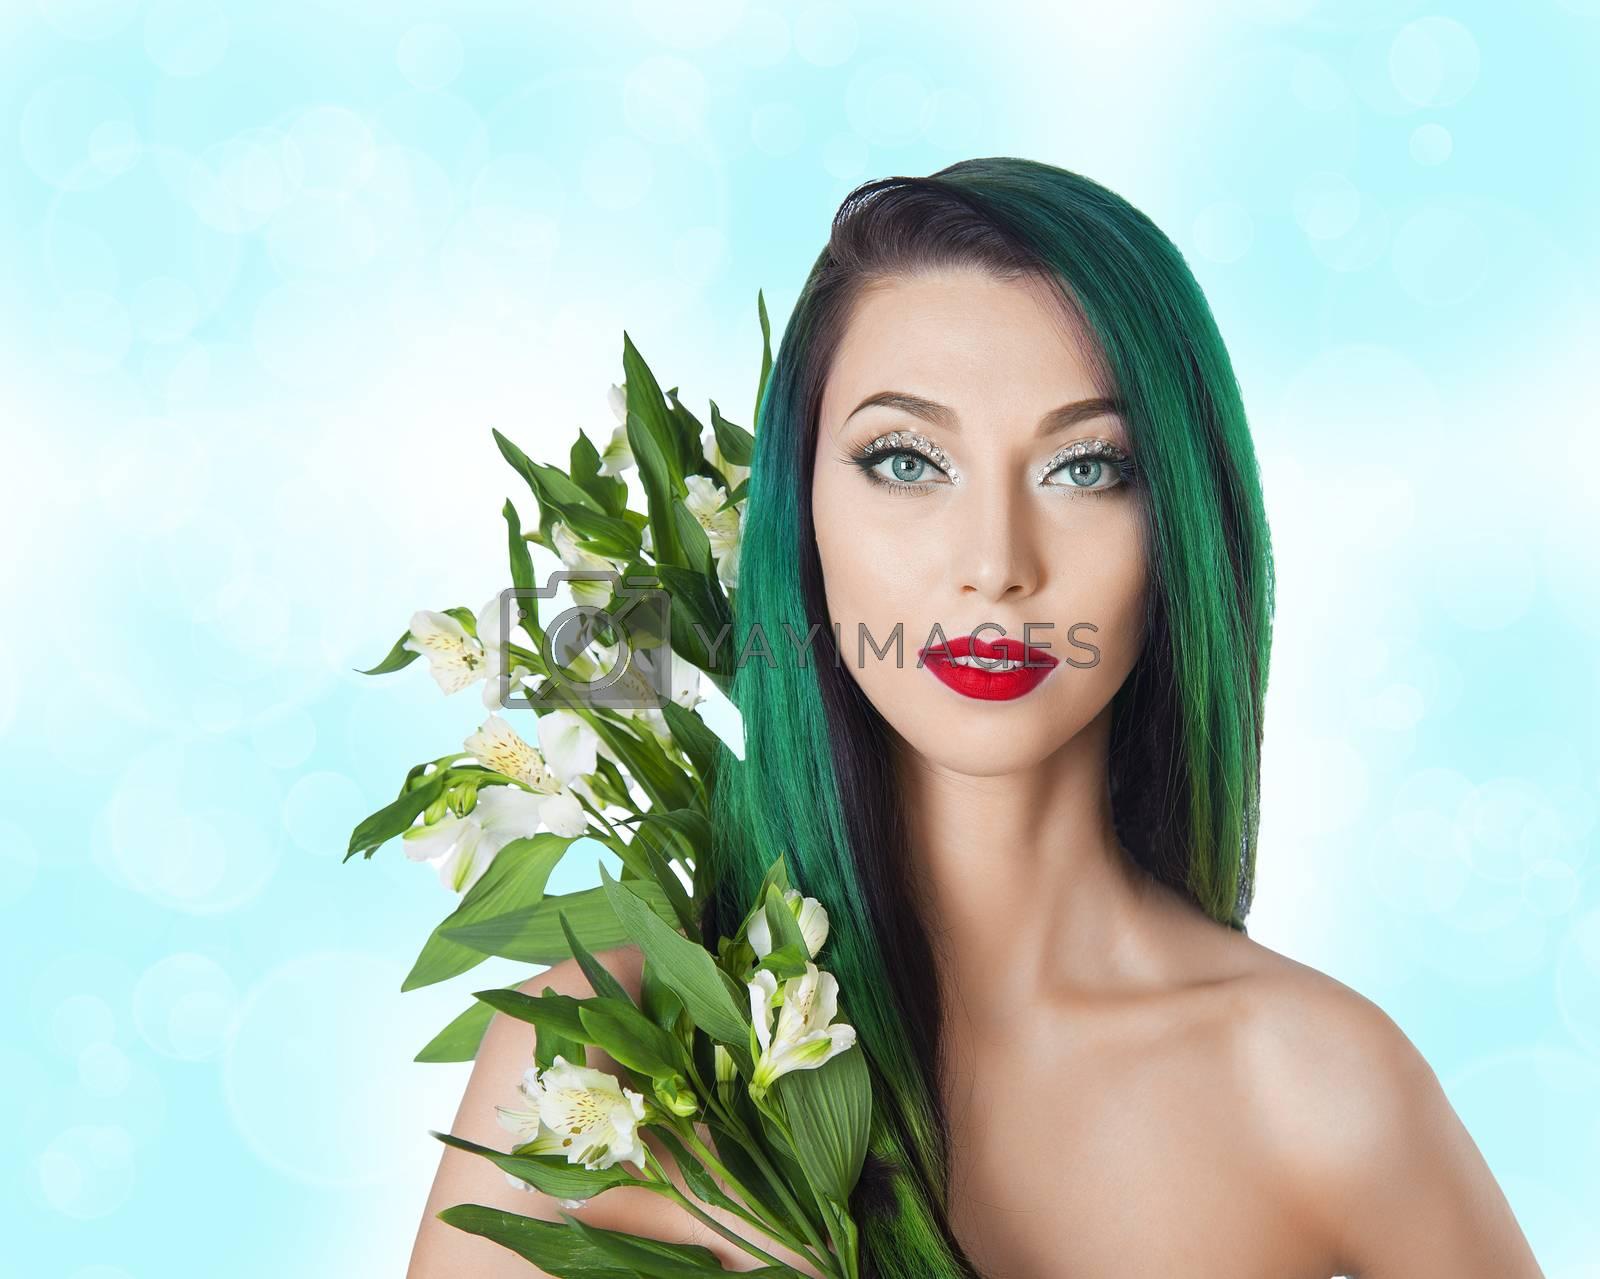 Royalty free image of mermaid by raduga21